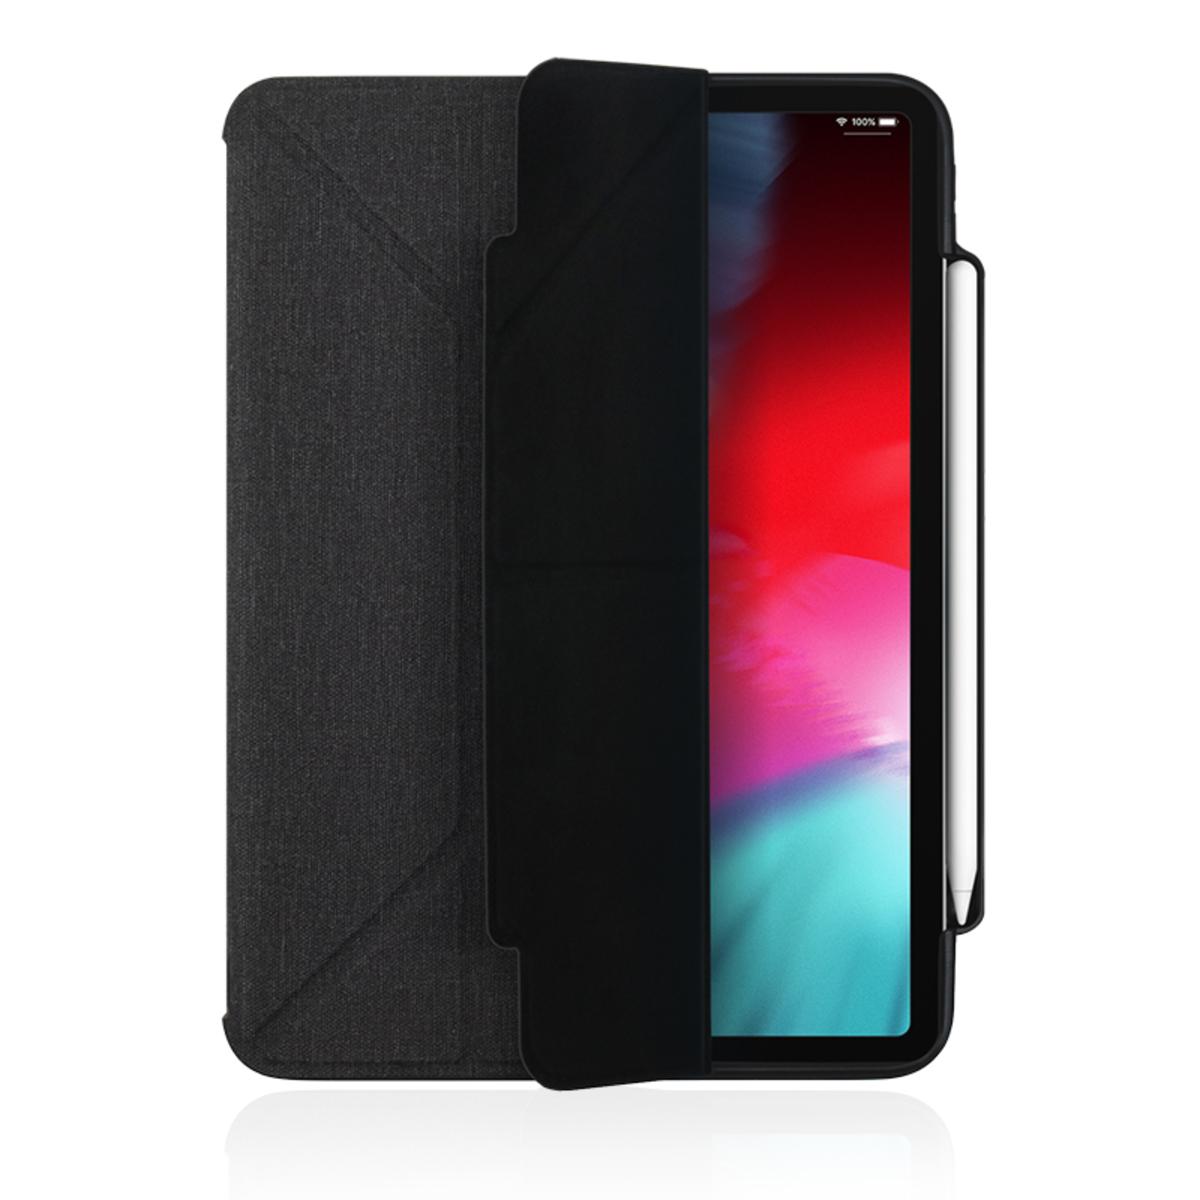 Amos QCAC Folio case for iPad Pro 11 (2018) with Pencil Holder - Dark Grey